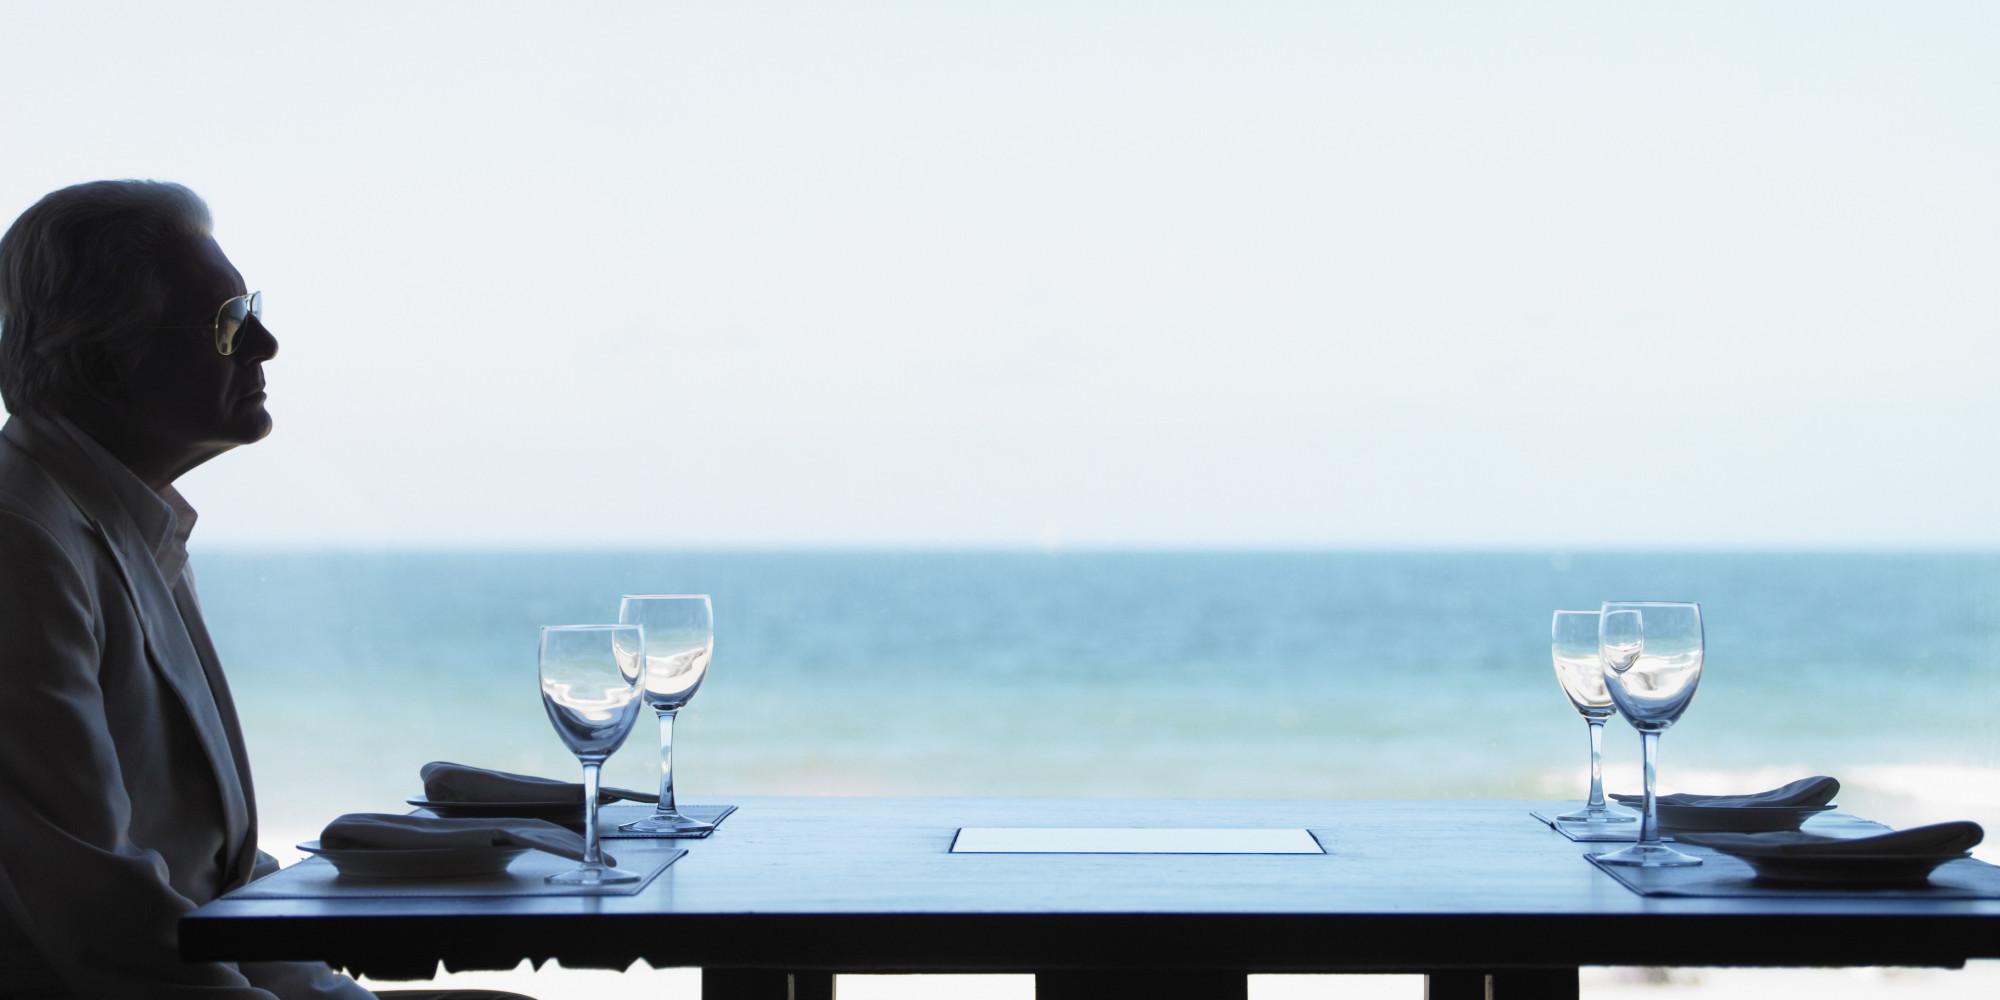 Senior Man Waiting at Ocean View Table